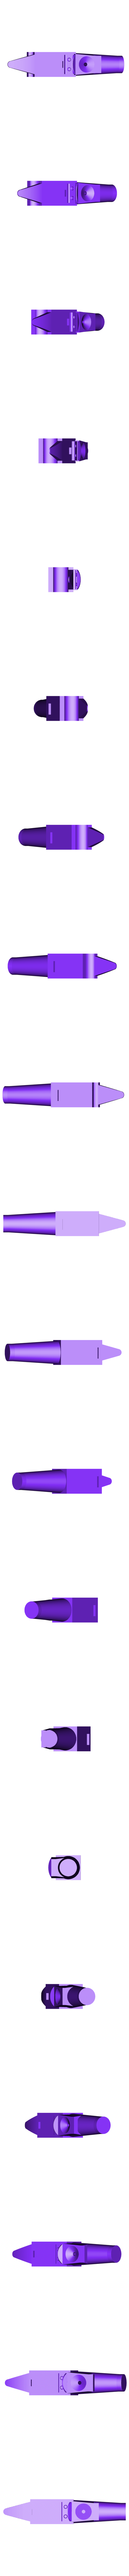 2_DuckfootGun_Receiver.stl Download free STL file Duck's foot gun • Object to 3D print, Snorri